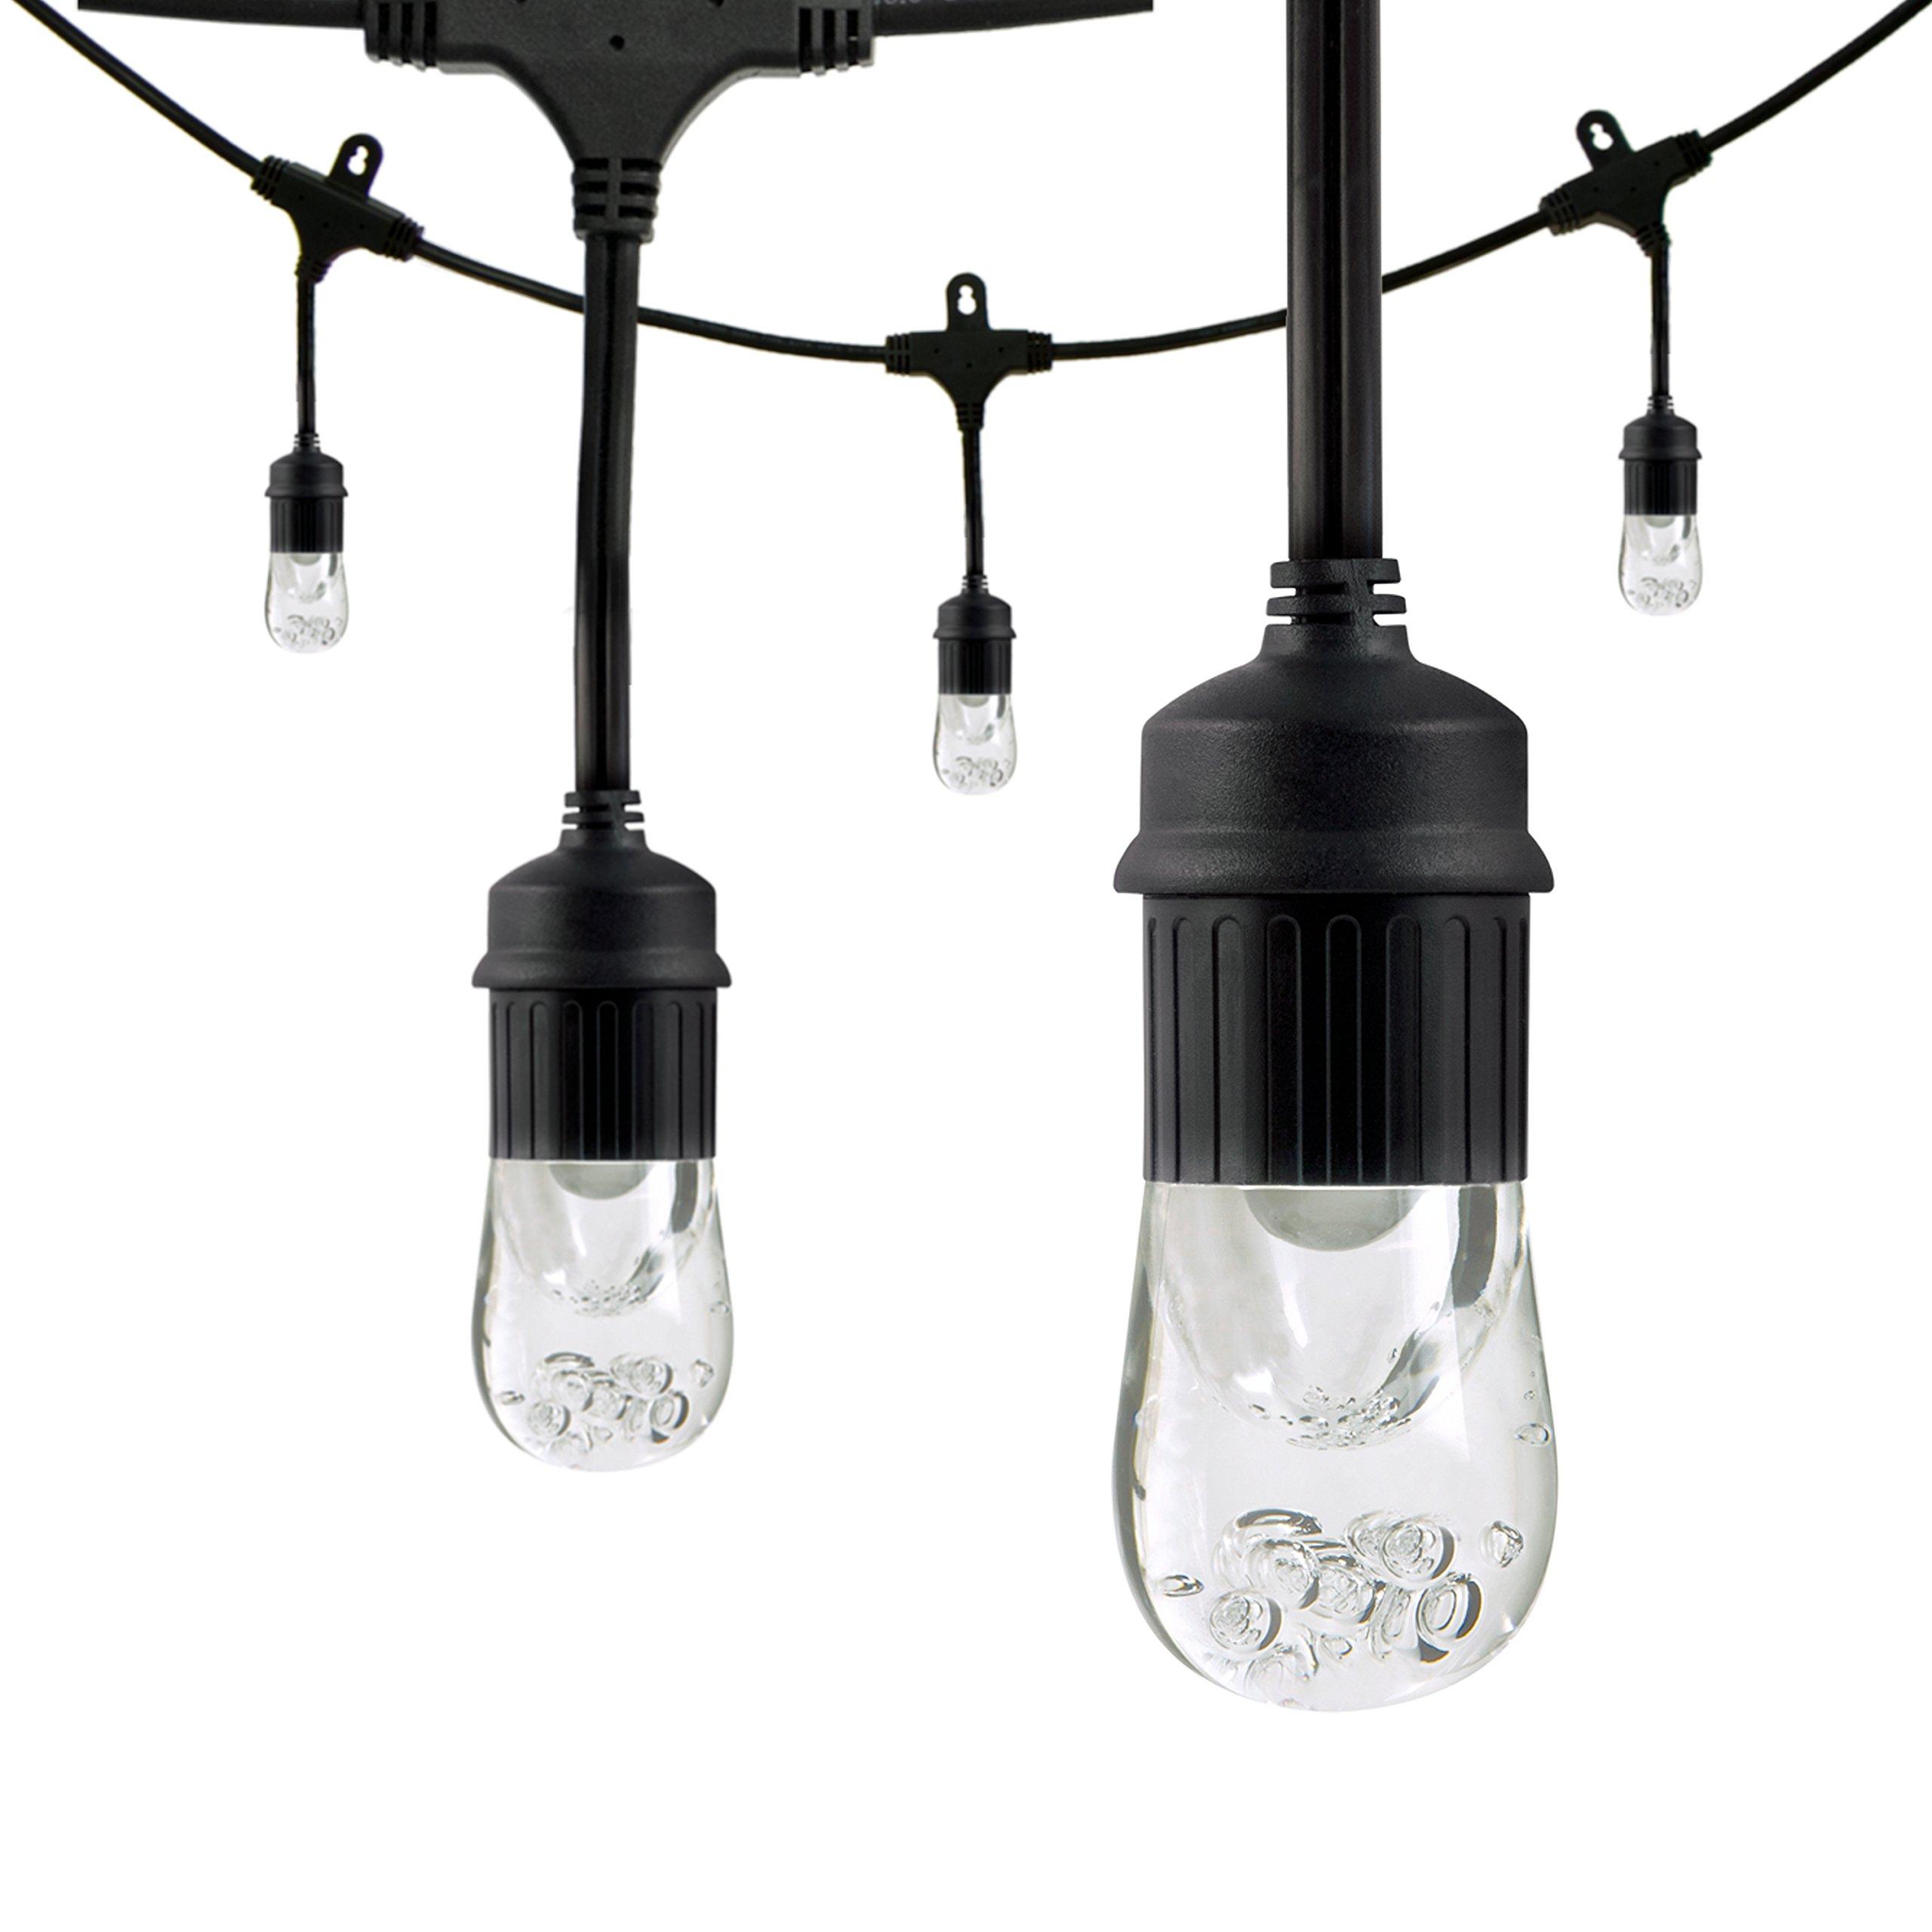 Enbrighten Classic LED Cafe String Lights, Black, 48 Foot Length, 24 Impact Resistant Lifetime Bulbs, Premium, Shatterproof, Weatherproof, Indoor/Outdoor, Commercial Grade, UL Listed, 31664